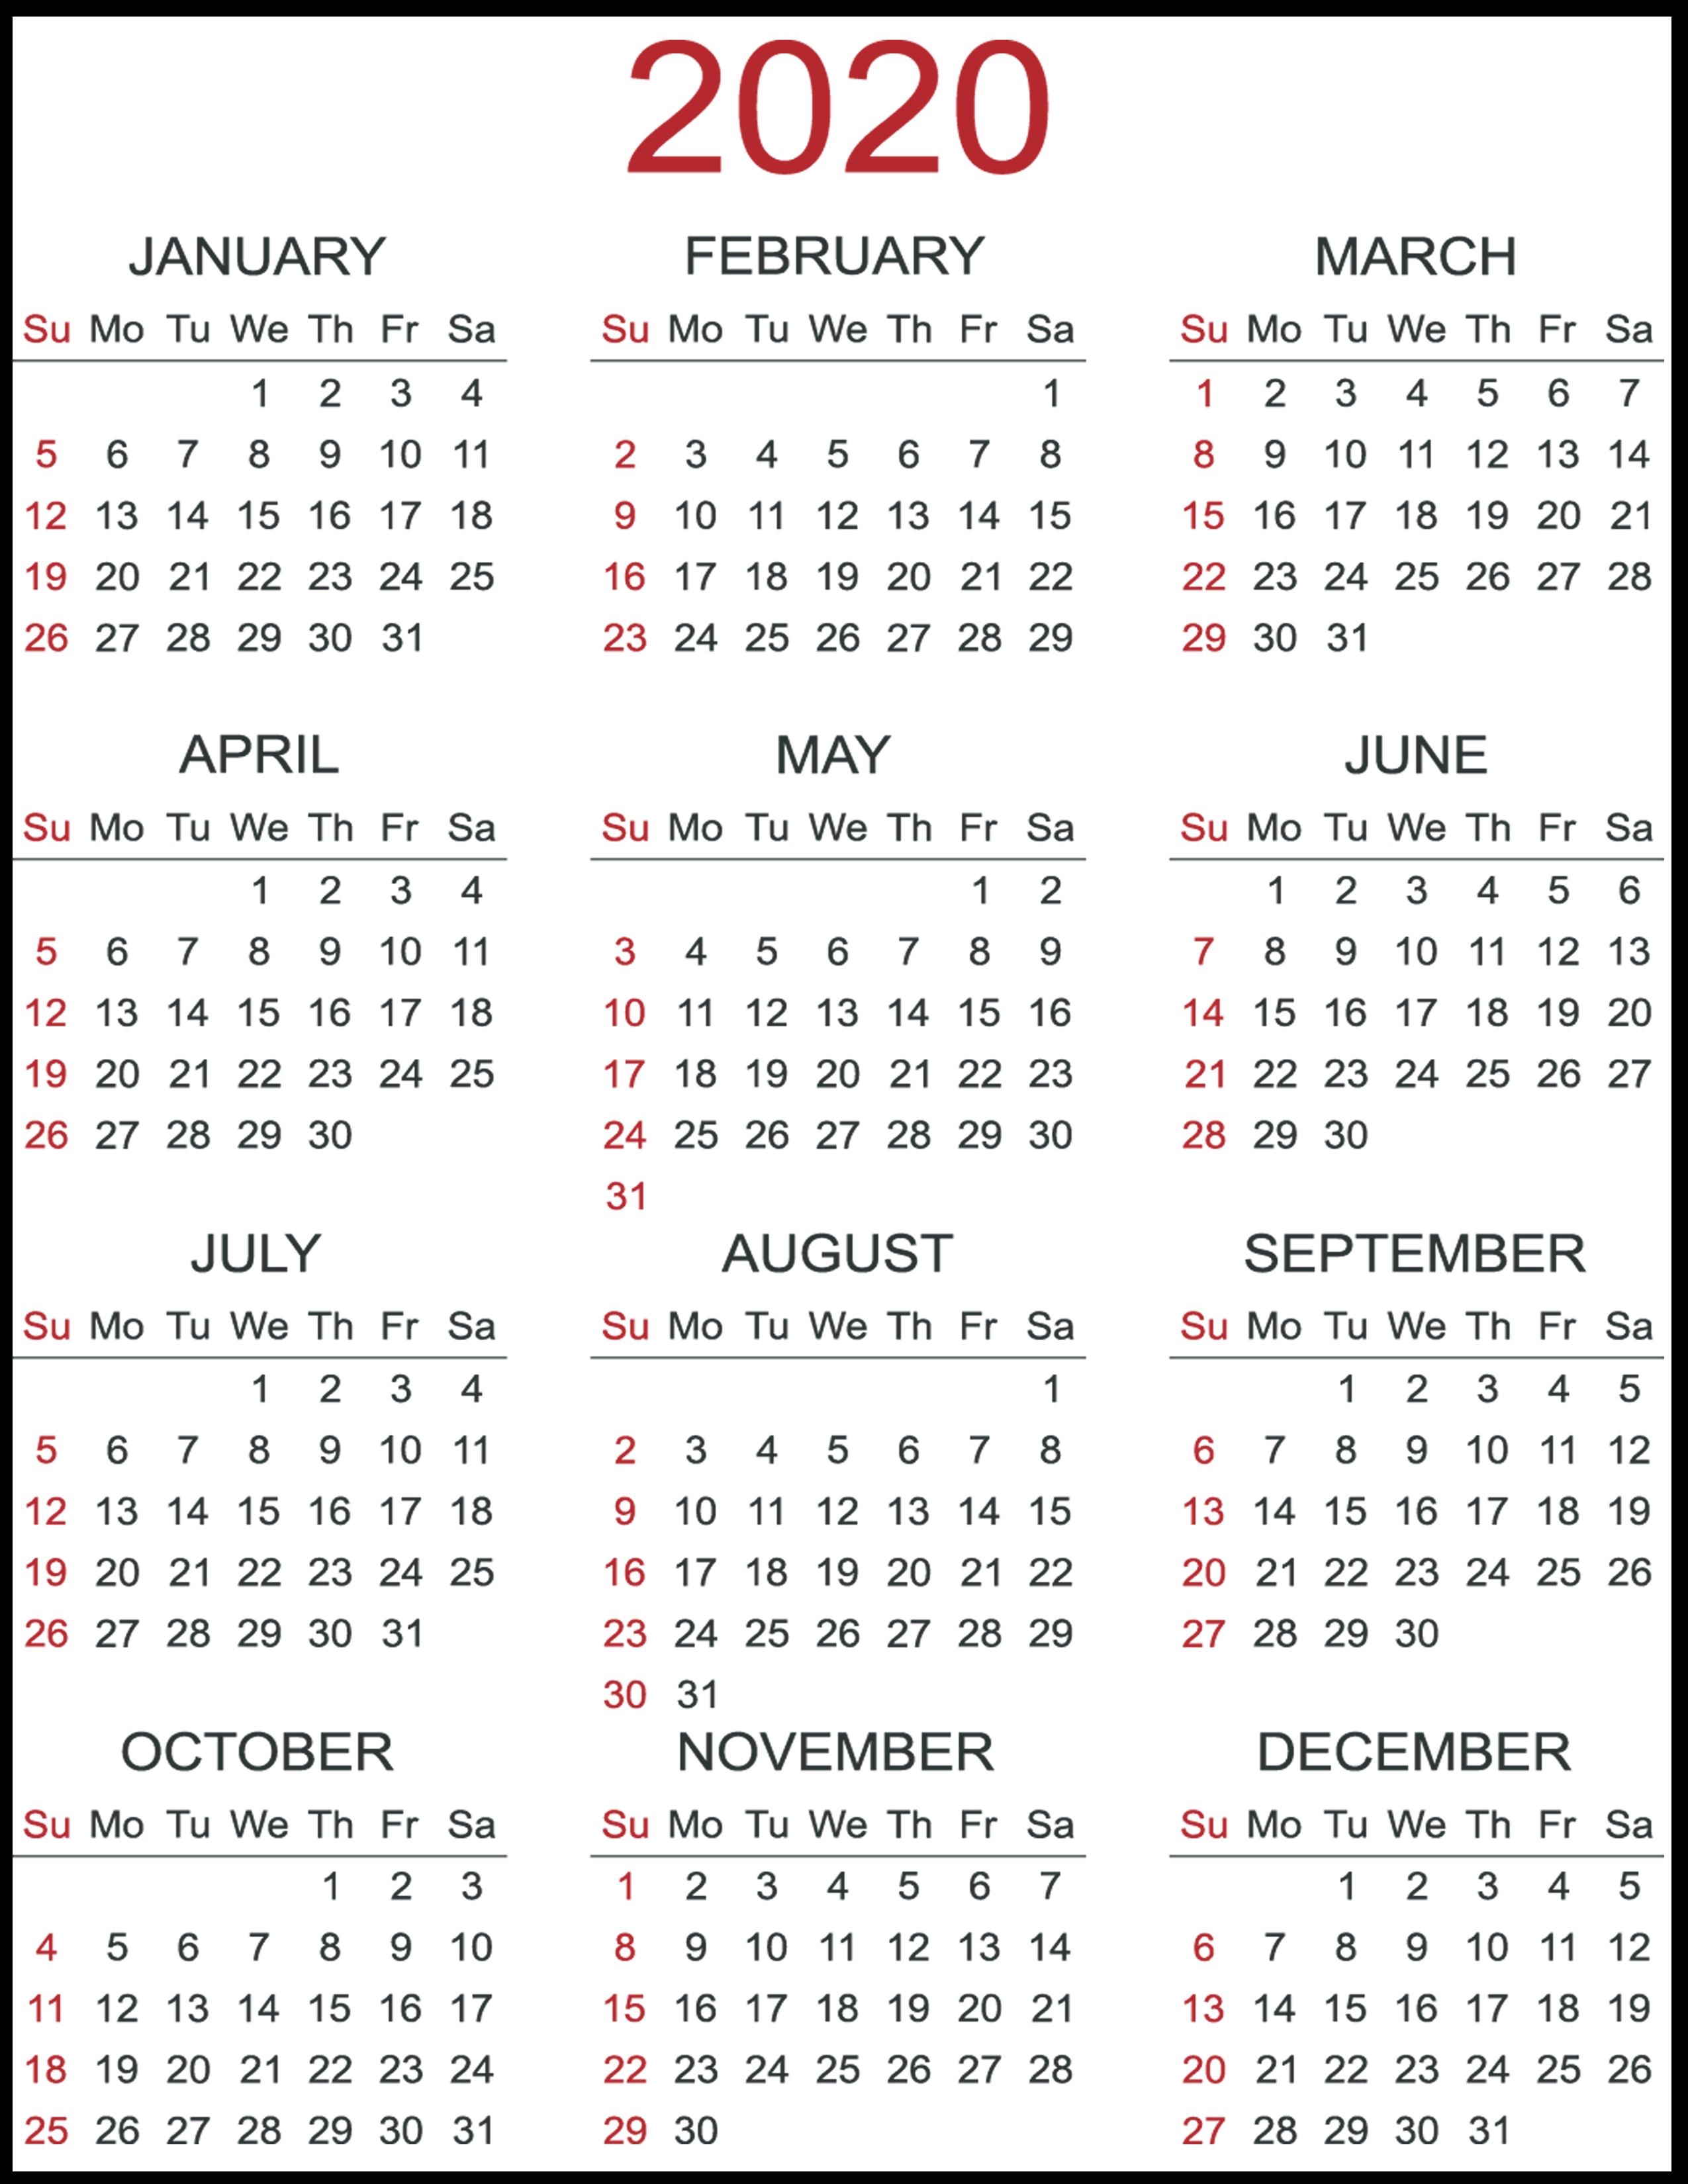 Calendar 2020 Free - Wpa.wpart.co